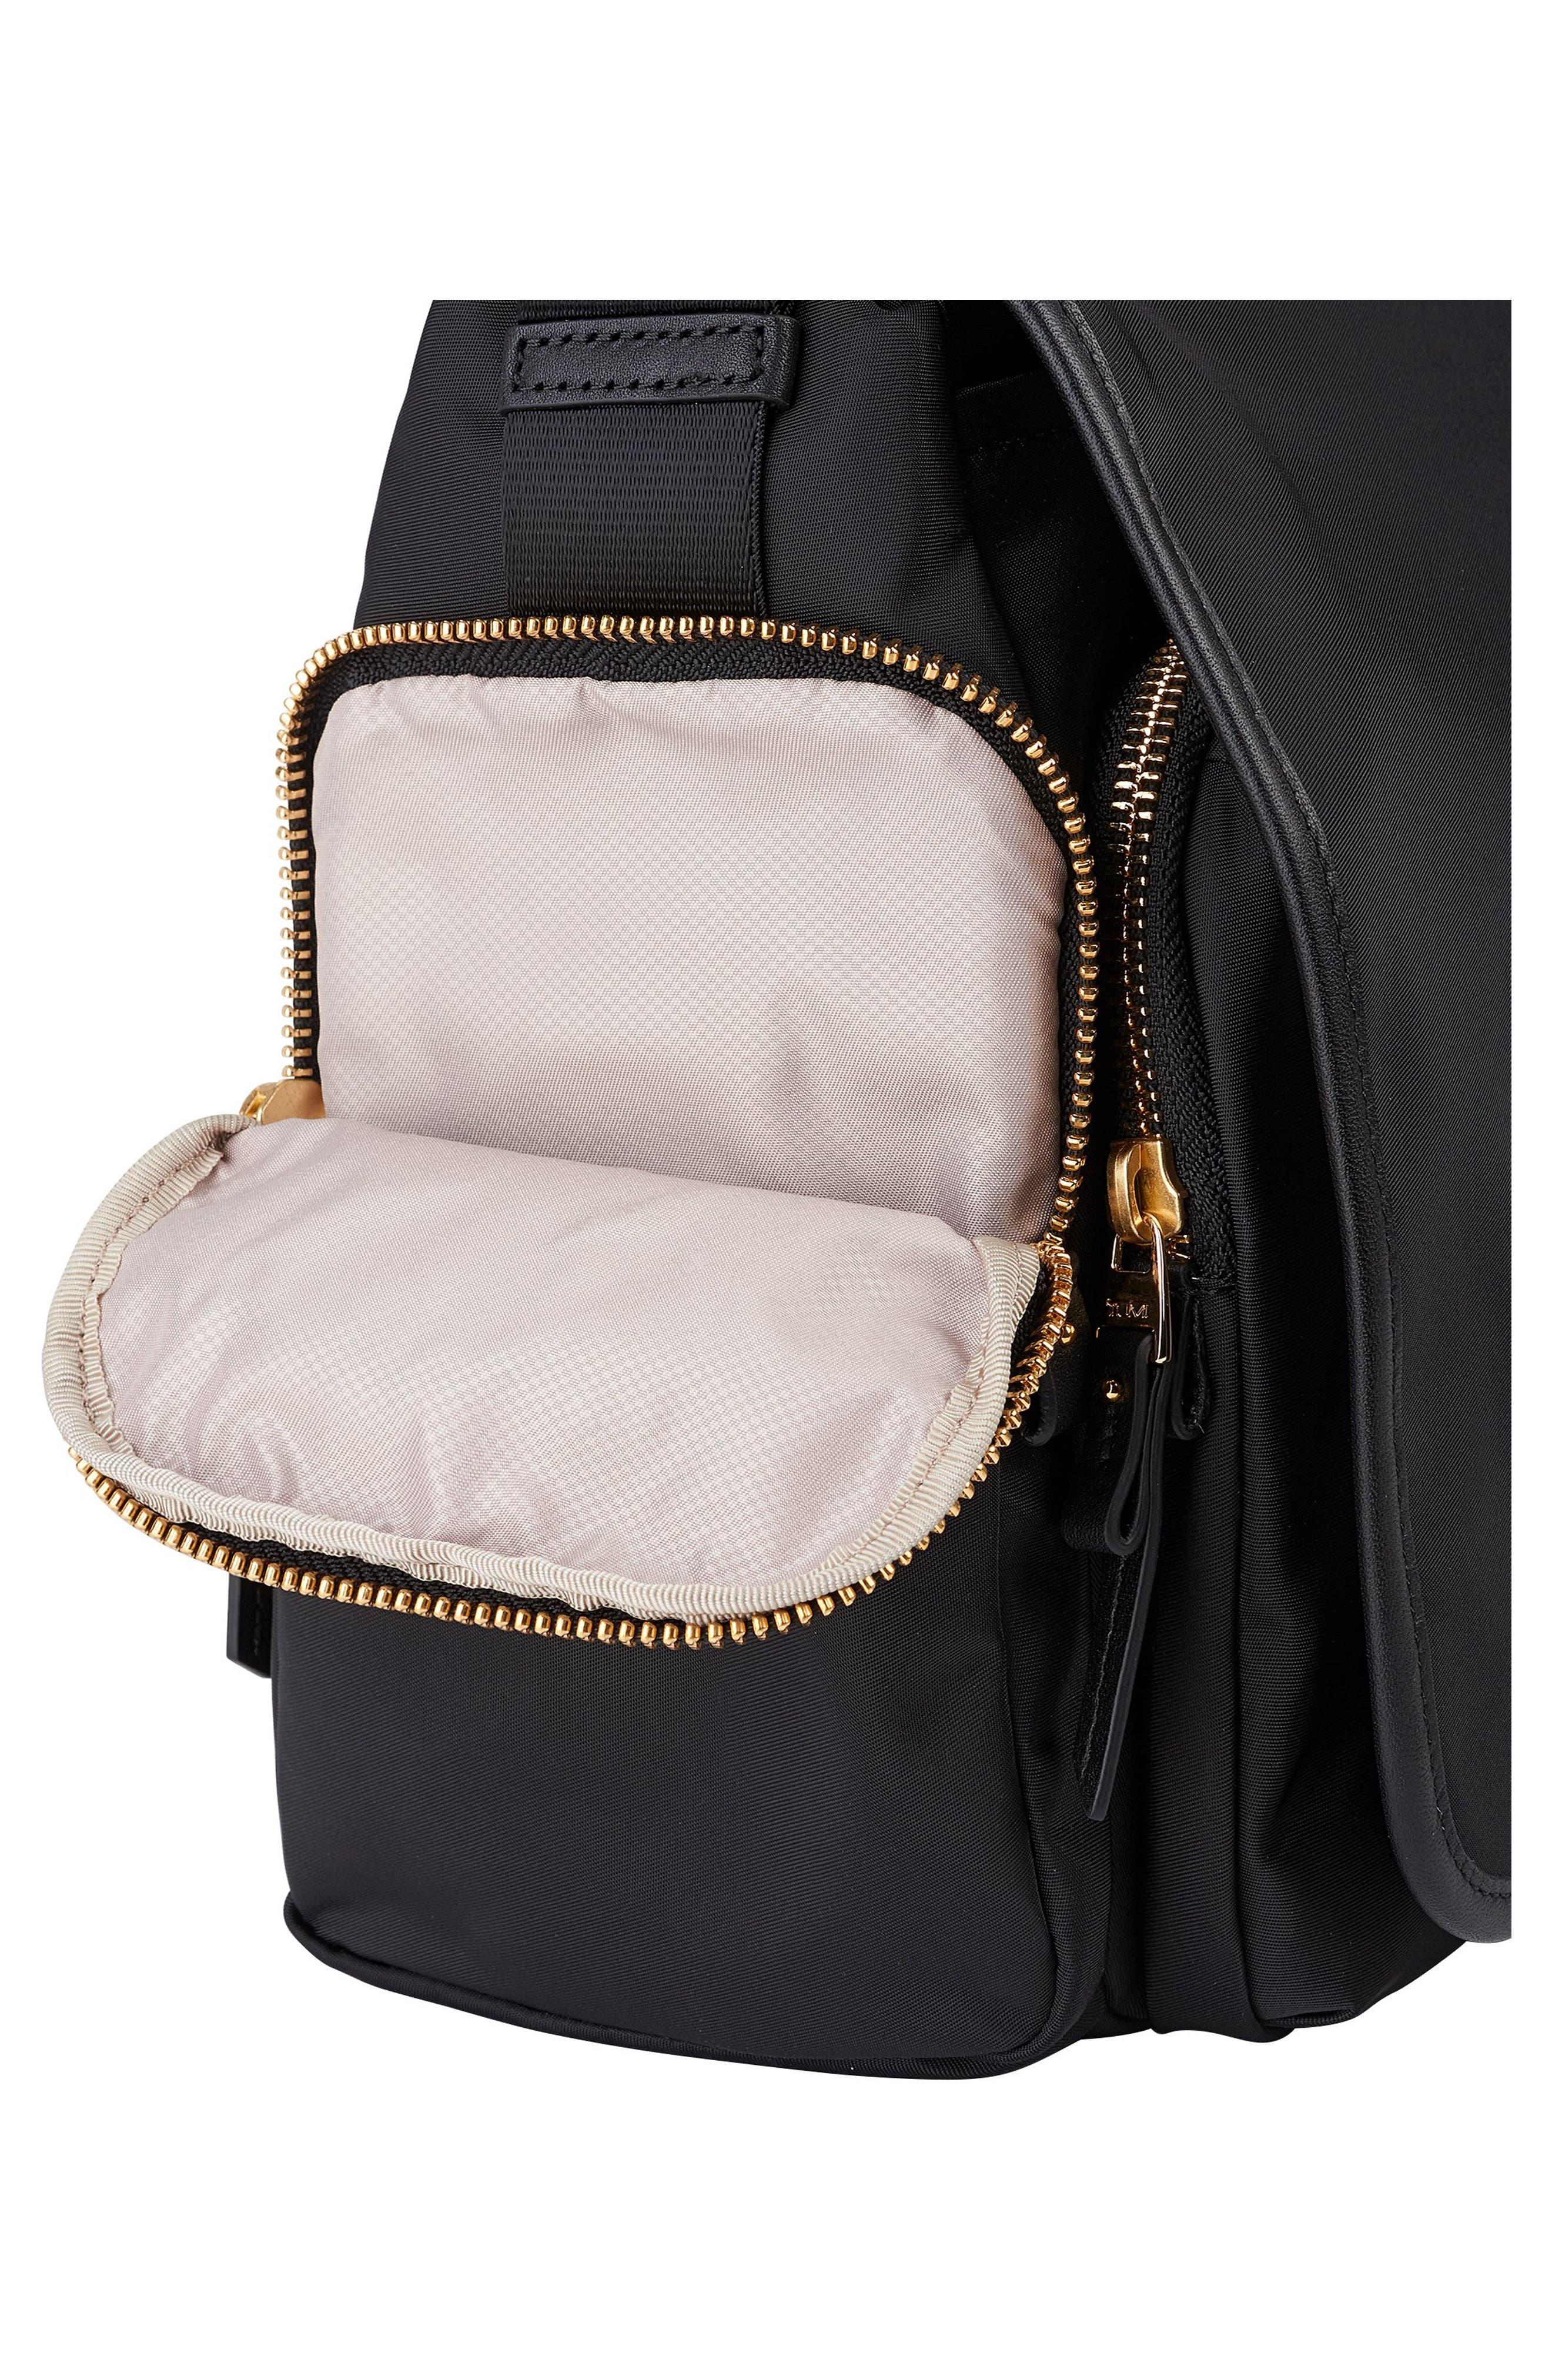 Lola Nylon Crossbody Bag,                             Alternate thumbnail 6, color,                             001